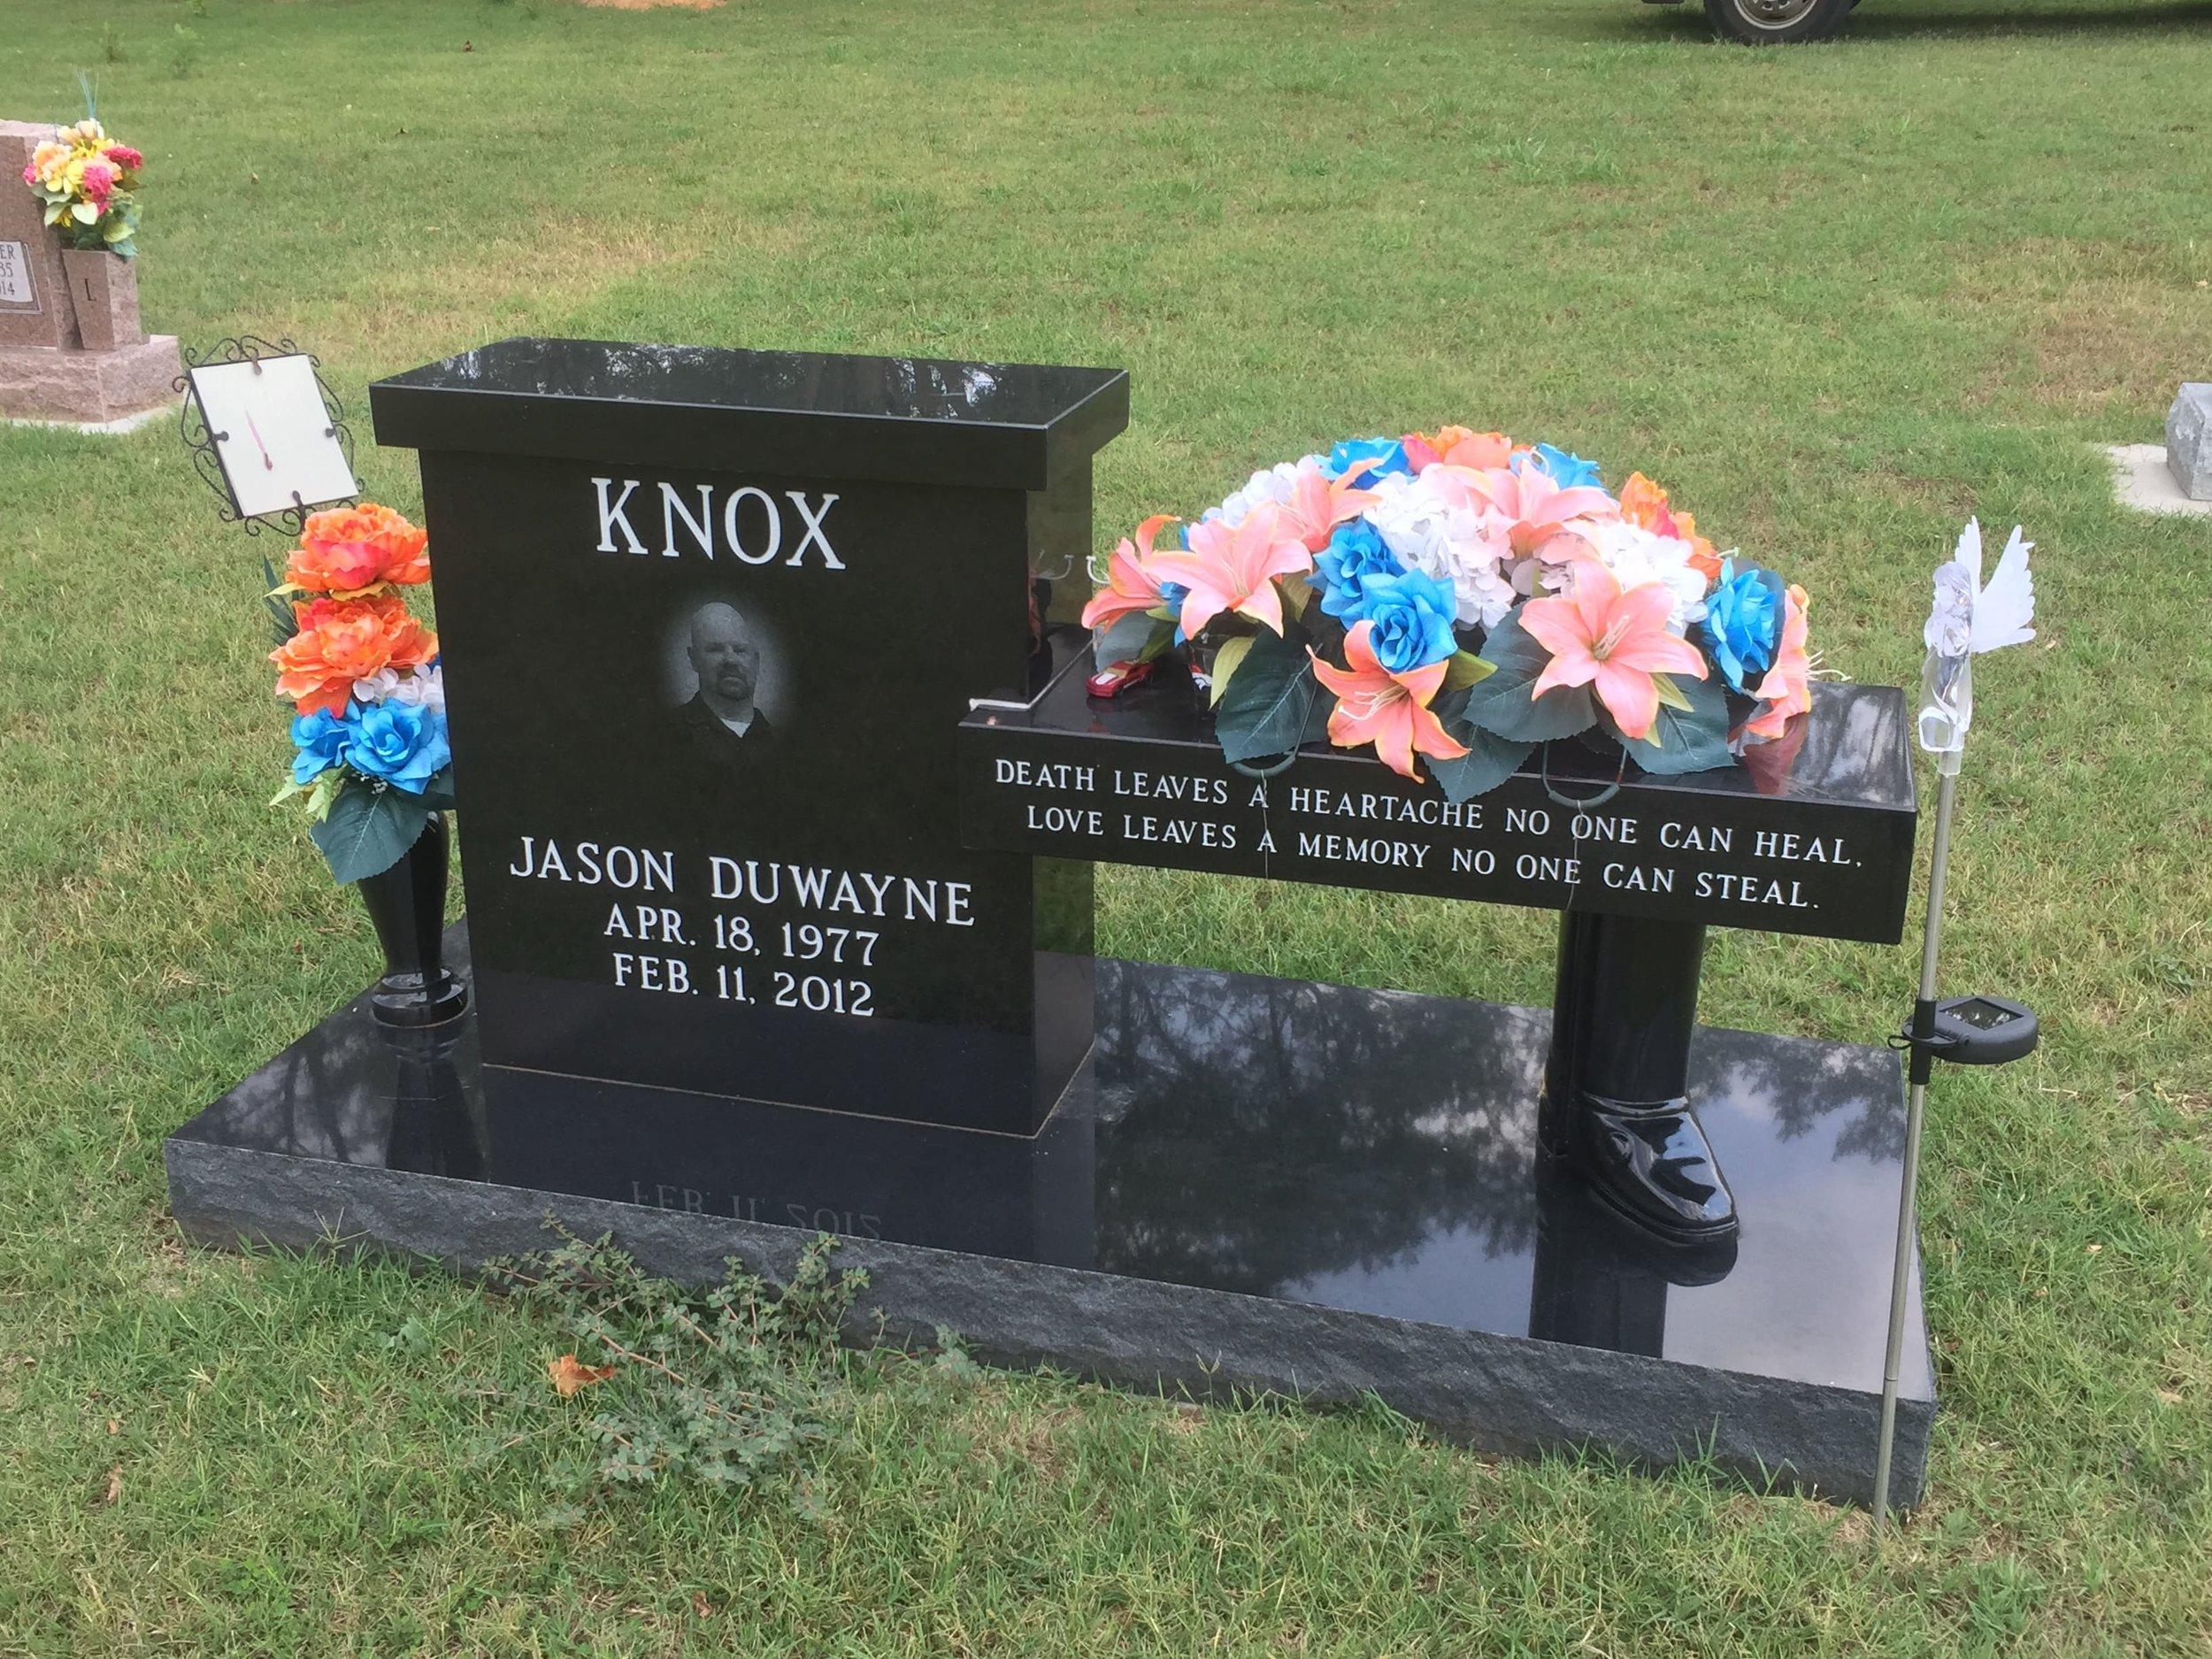 60. Memory Lane Cemetery, Harrah